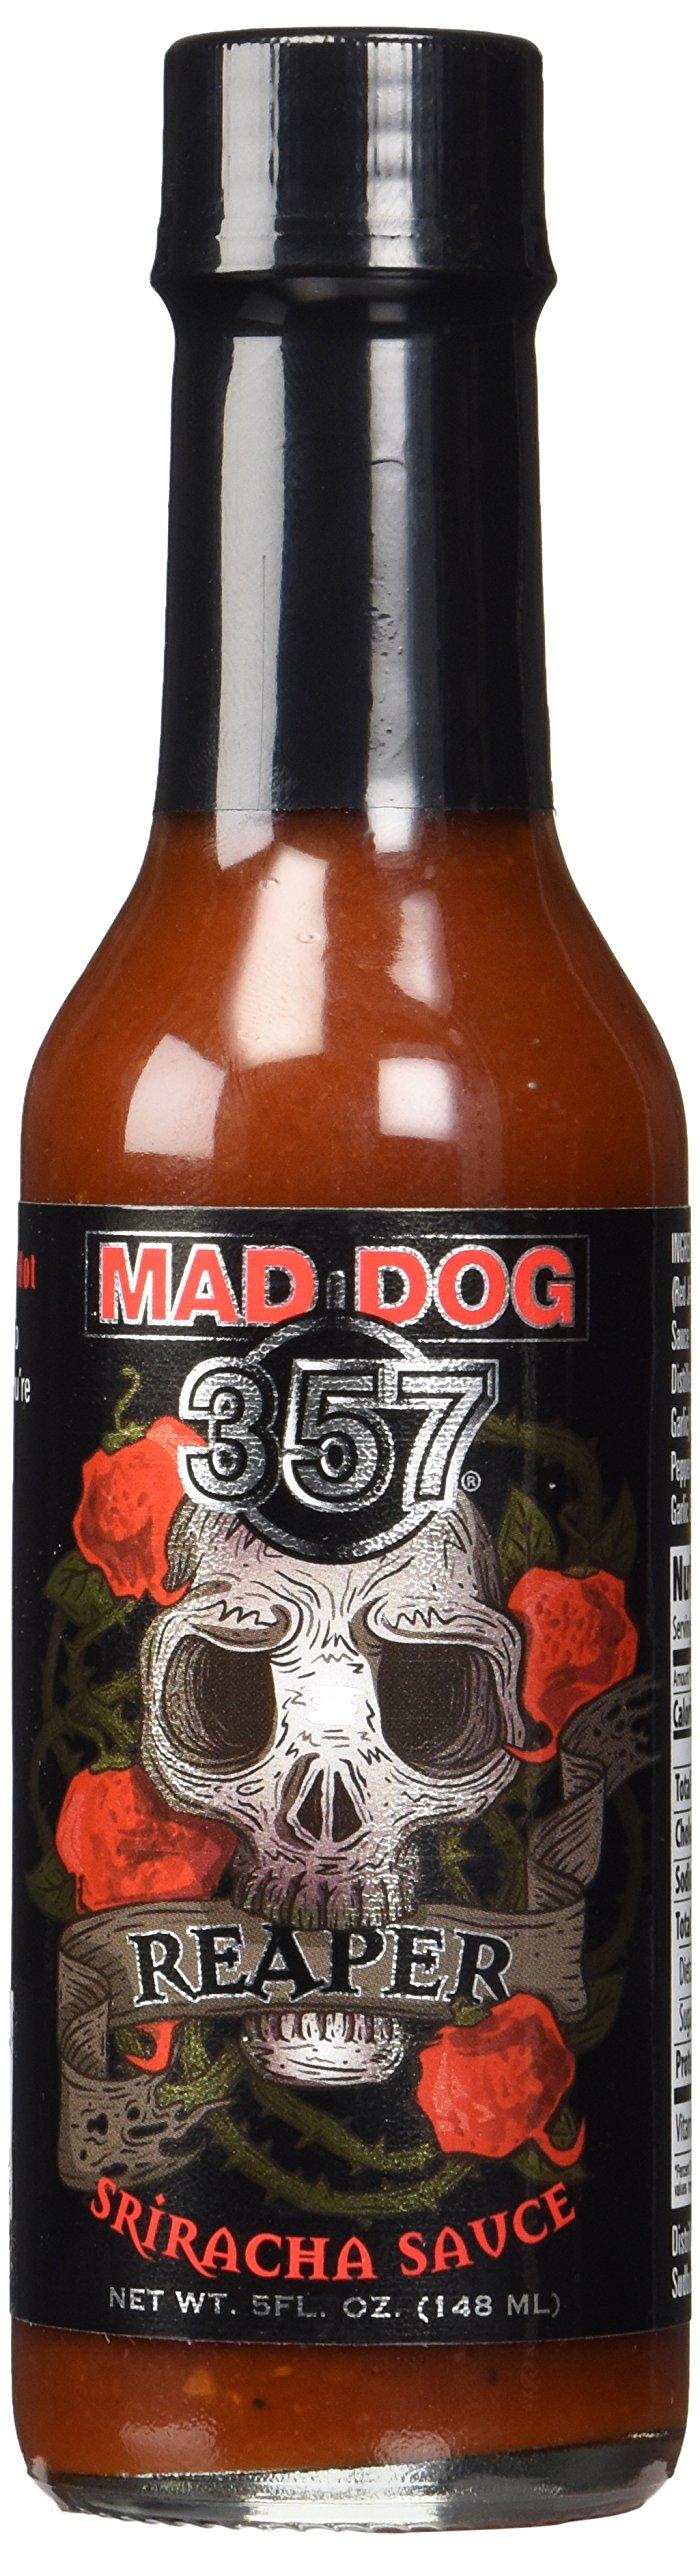 Mad Dog 357 Reaper Sriracha Sauce 5oz